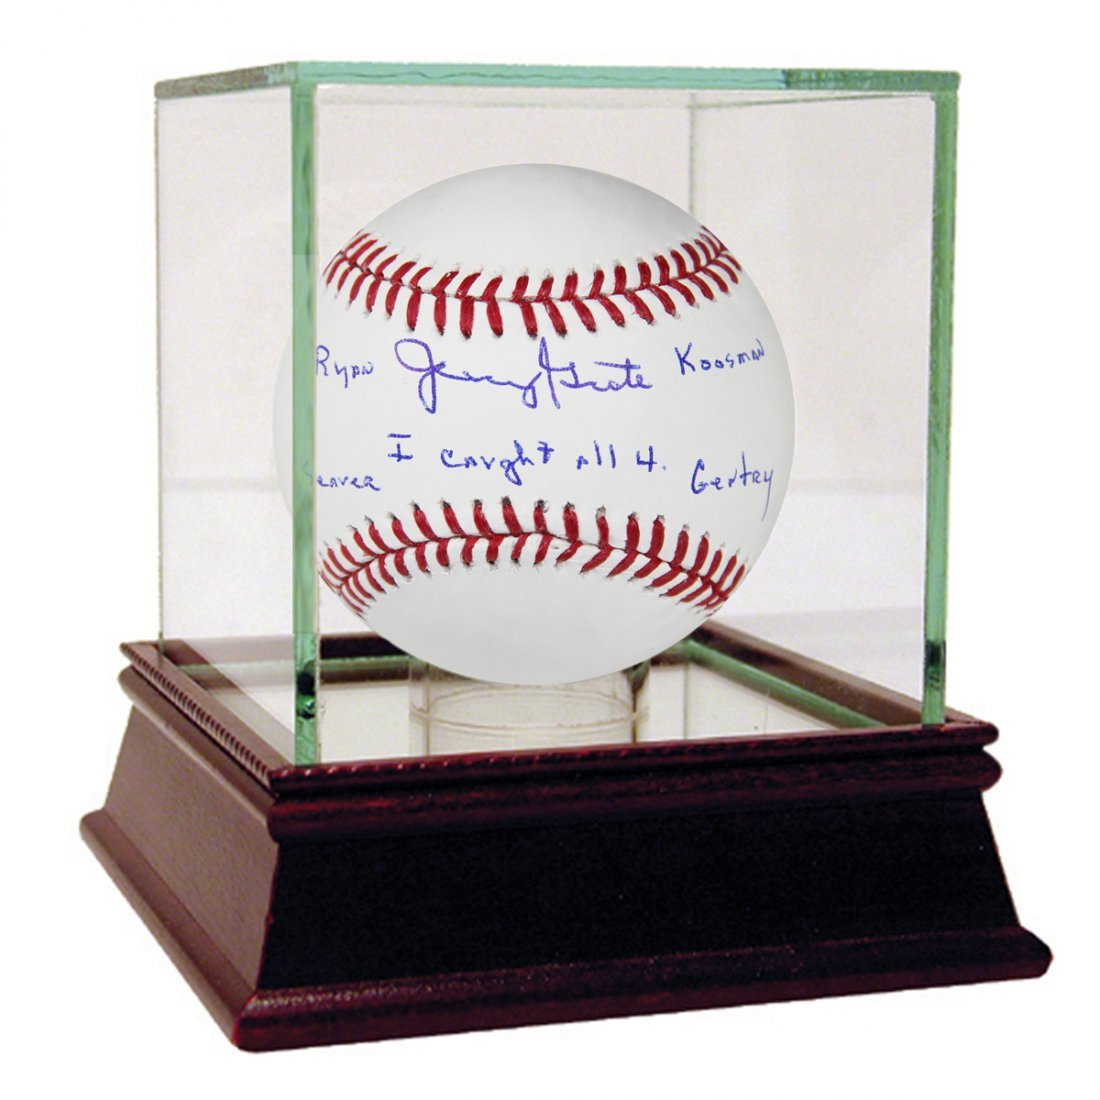 Jerry Grote Signed MLB Baseball w/ I caught all 4. Rya